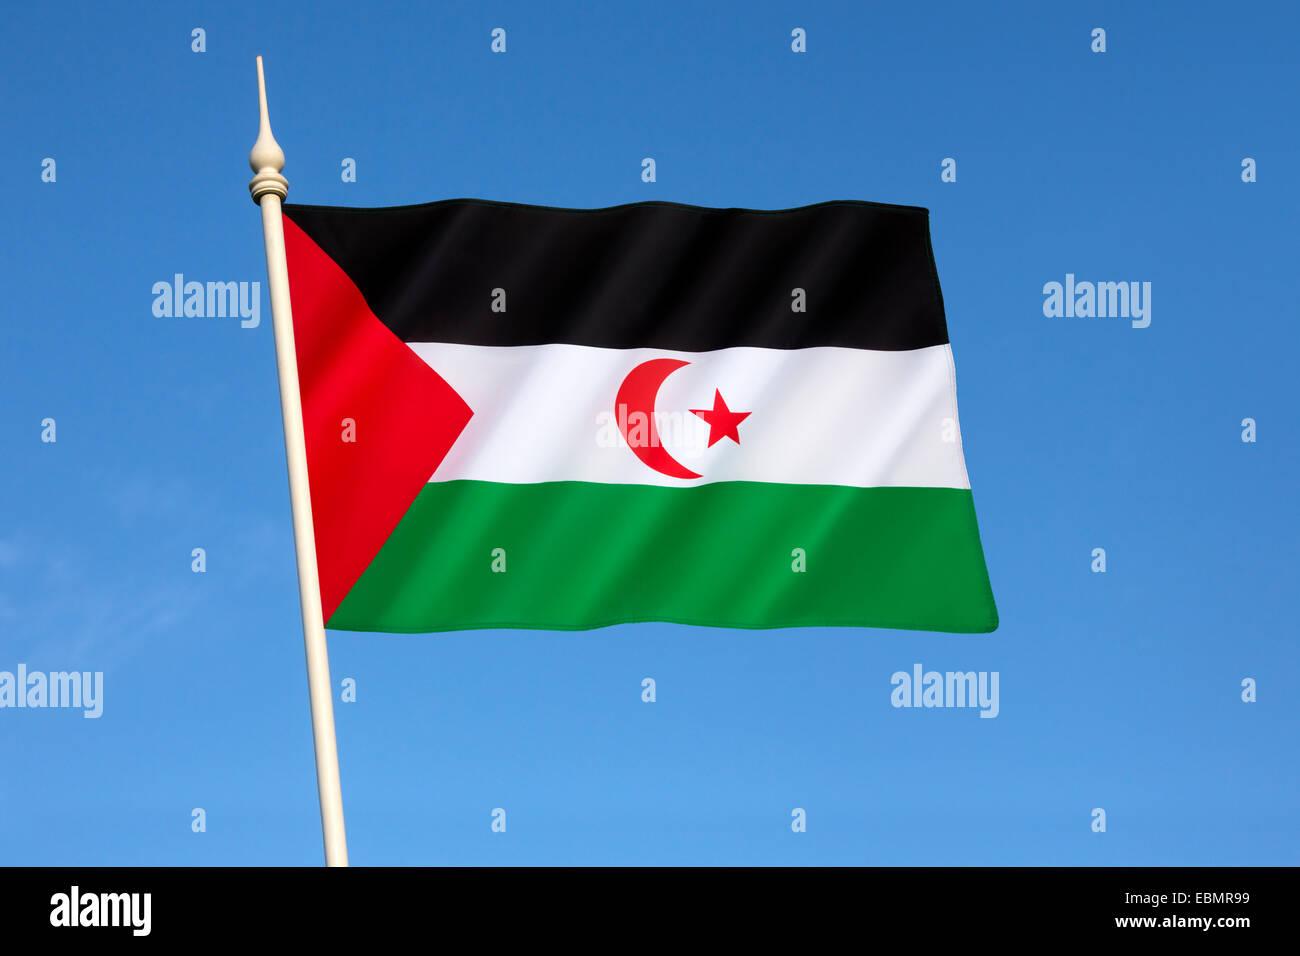 Flag of the Sahrawi Arab Democratic Republic - Western Sahara Stock Photo